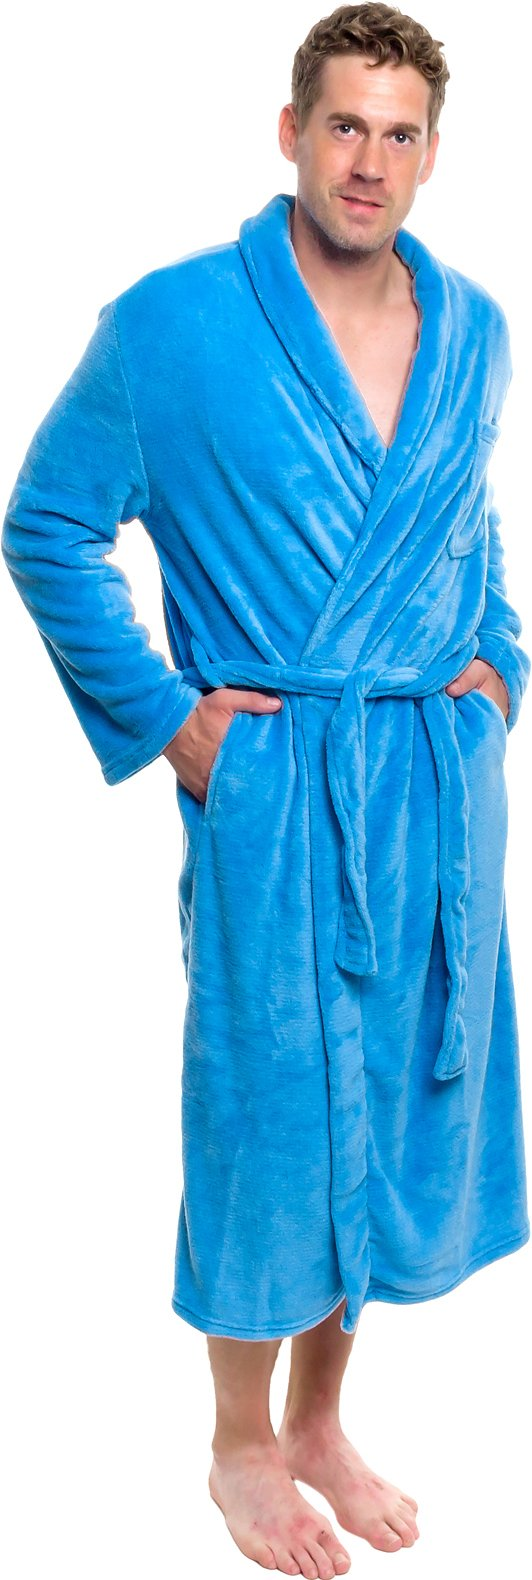 Ross Michaels Mens Plush Shawl Collar Kimono Bathrobe Robe (Light Blue, XXXL)